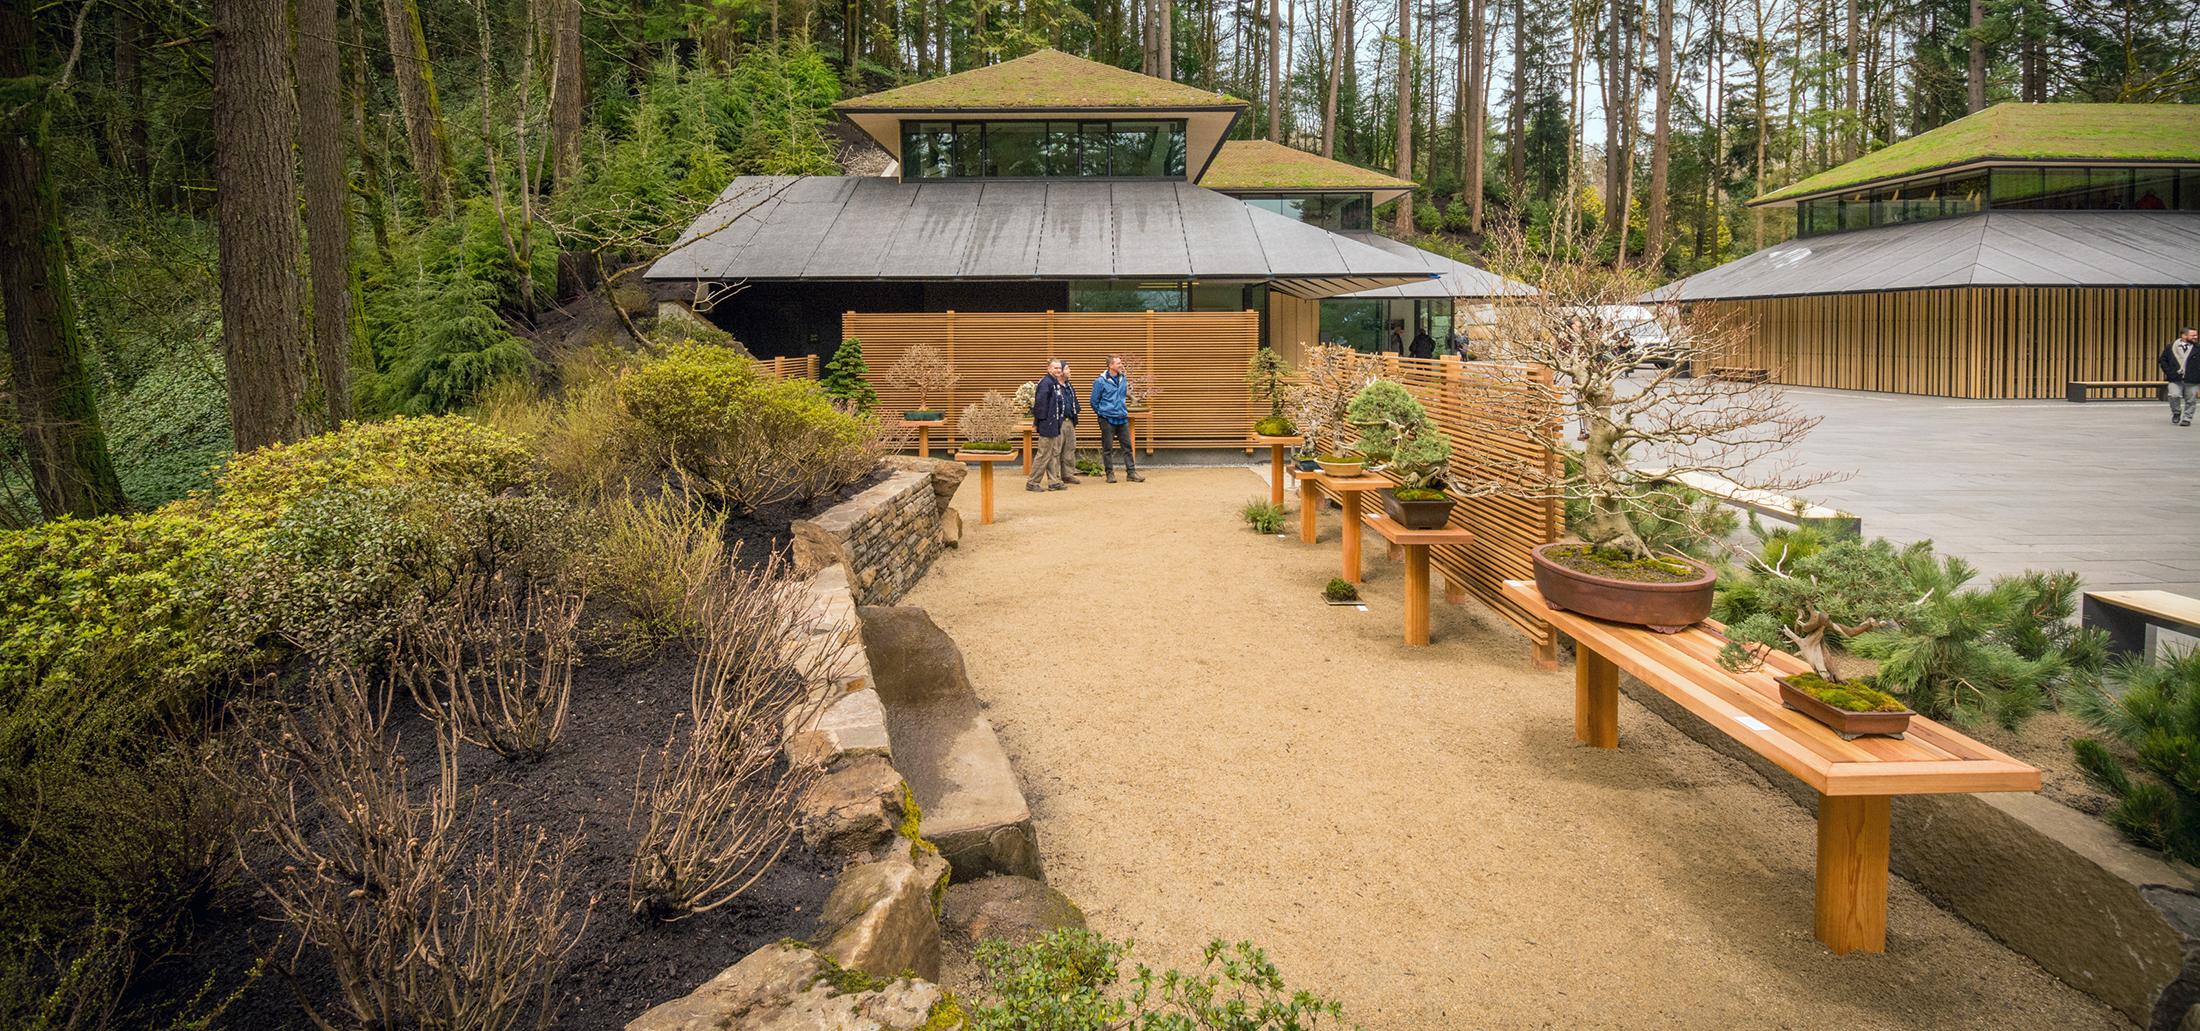 Kengo Kuma Expands the Portland Japanese Garden - Galerie